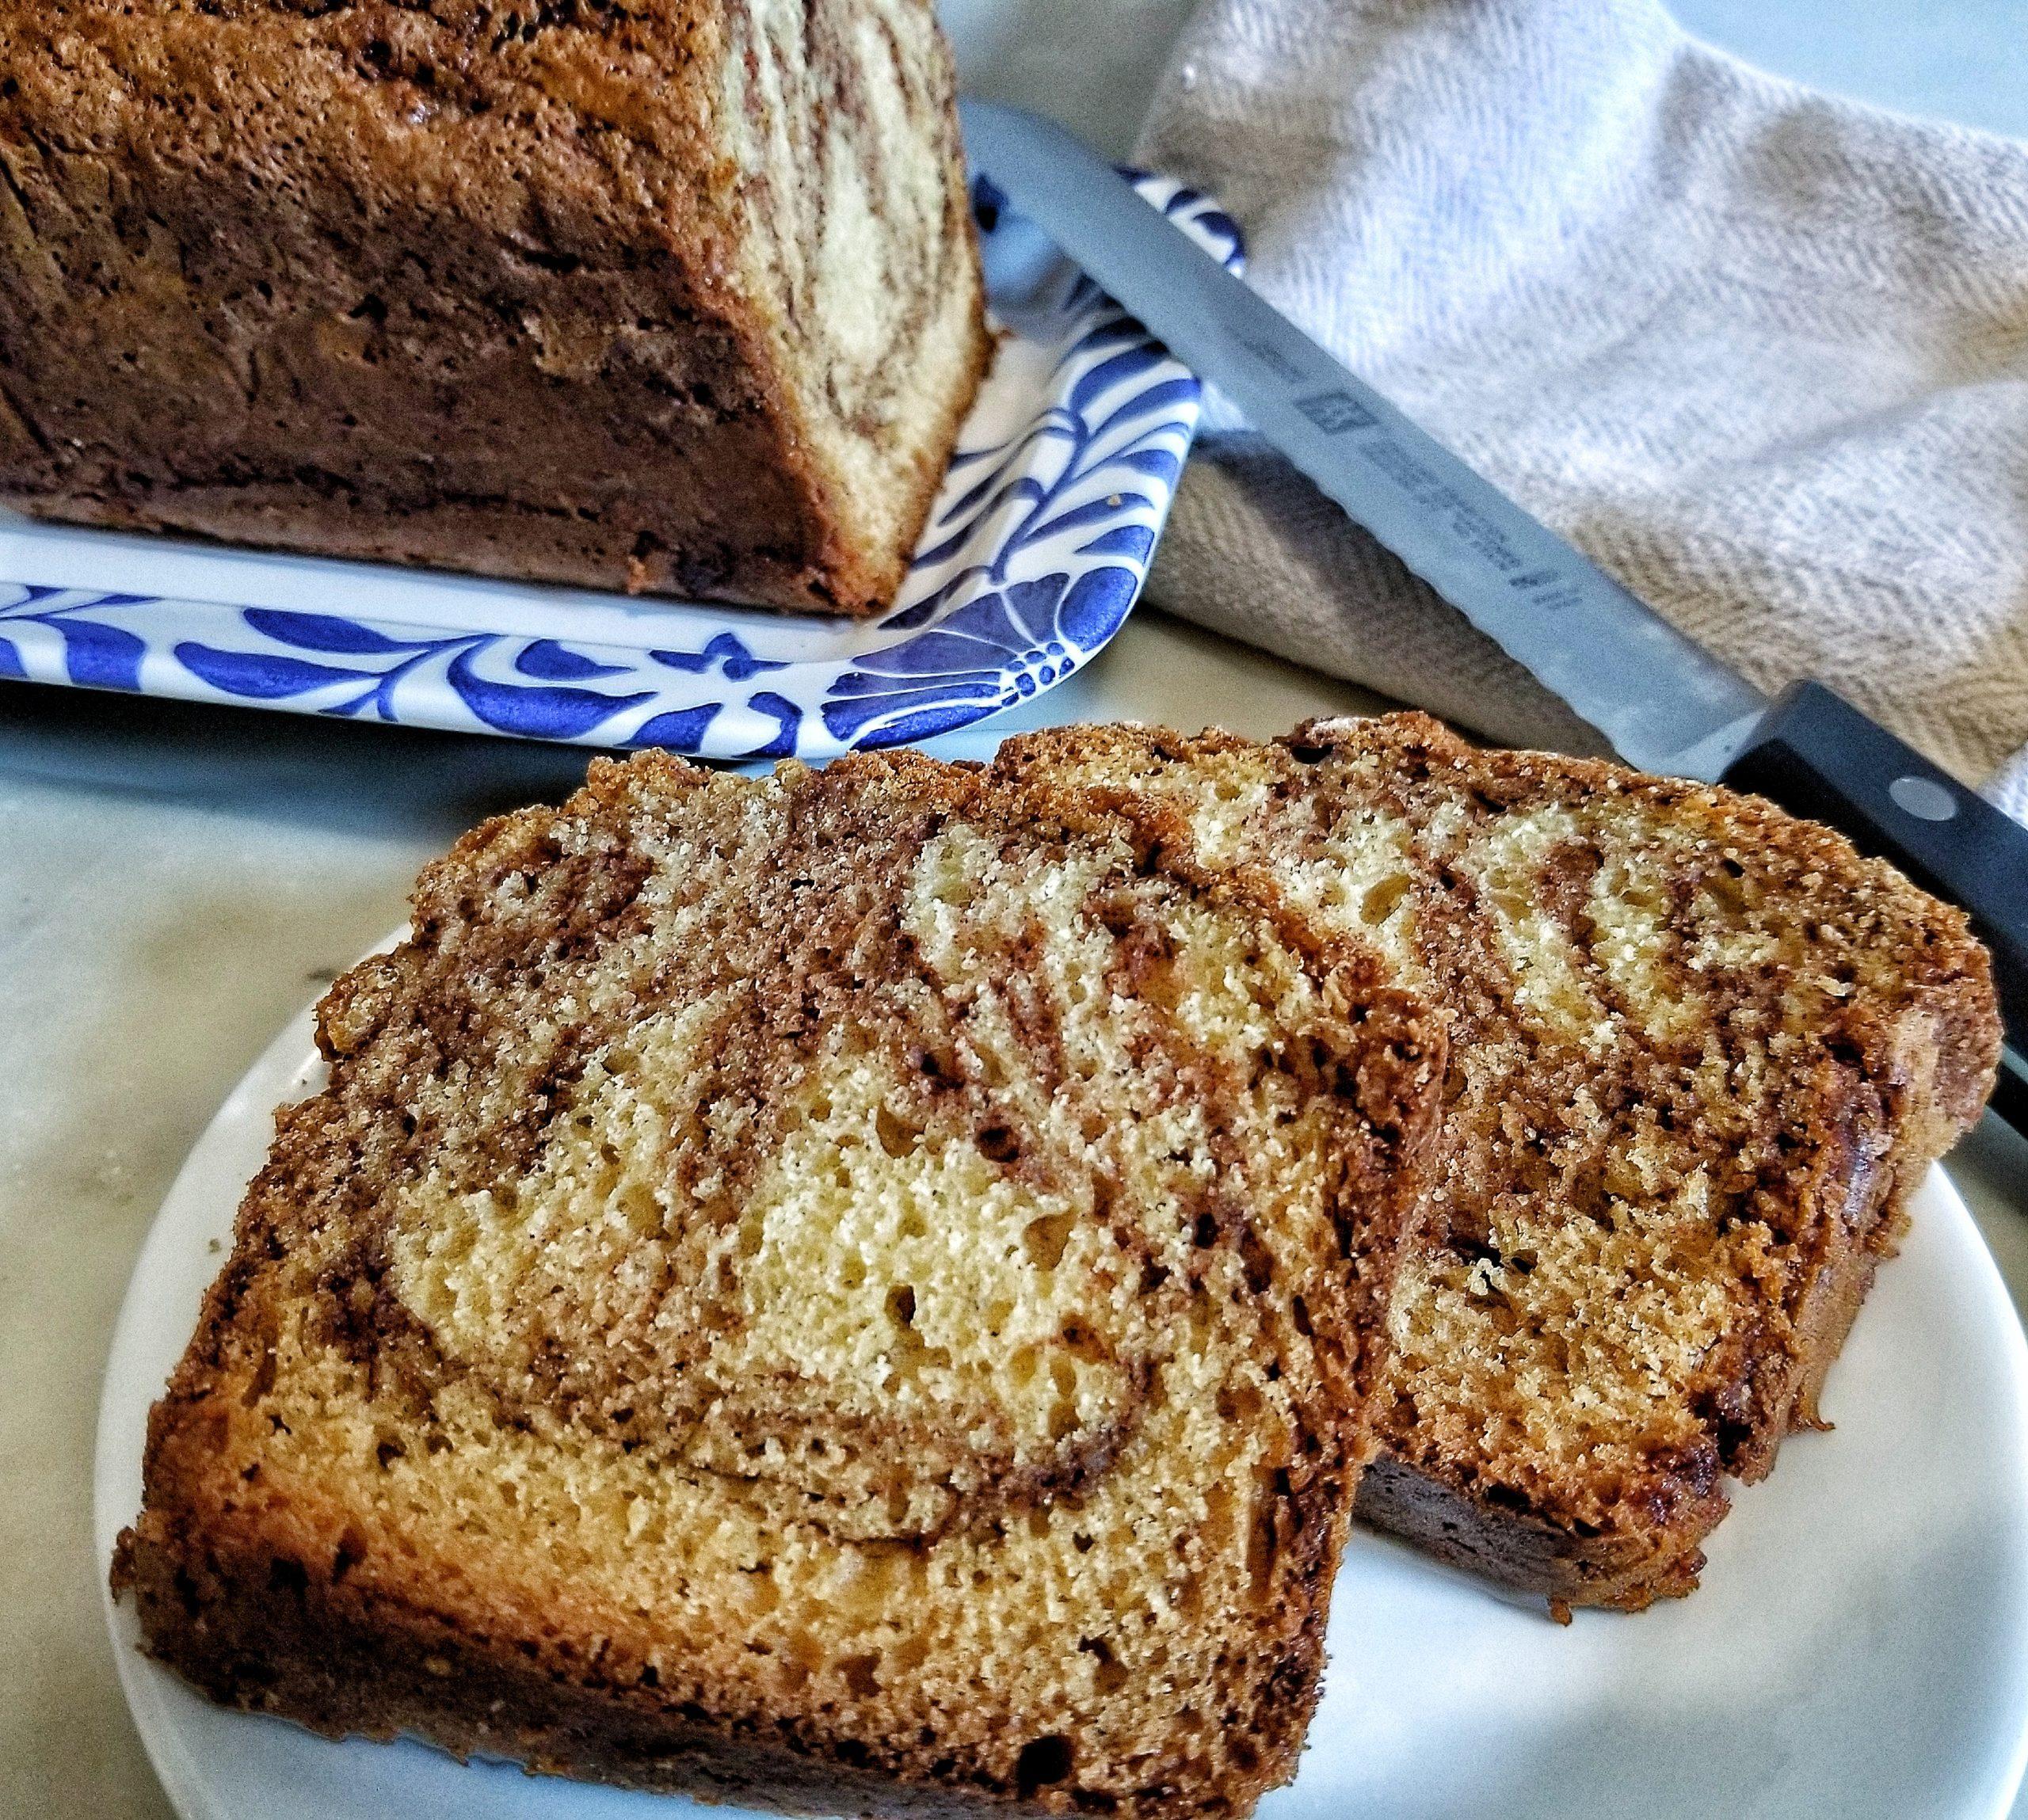 Cinnamon Swirl Buttermilk Loaf